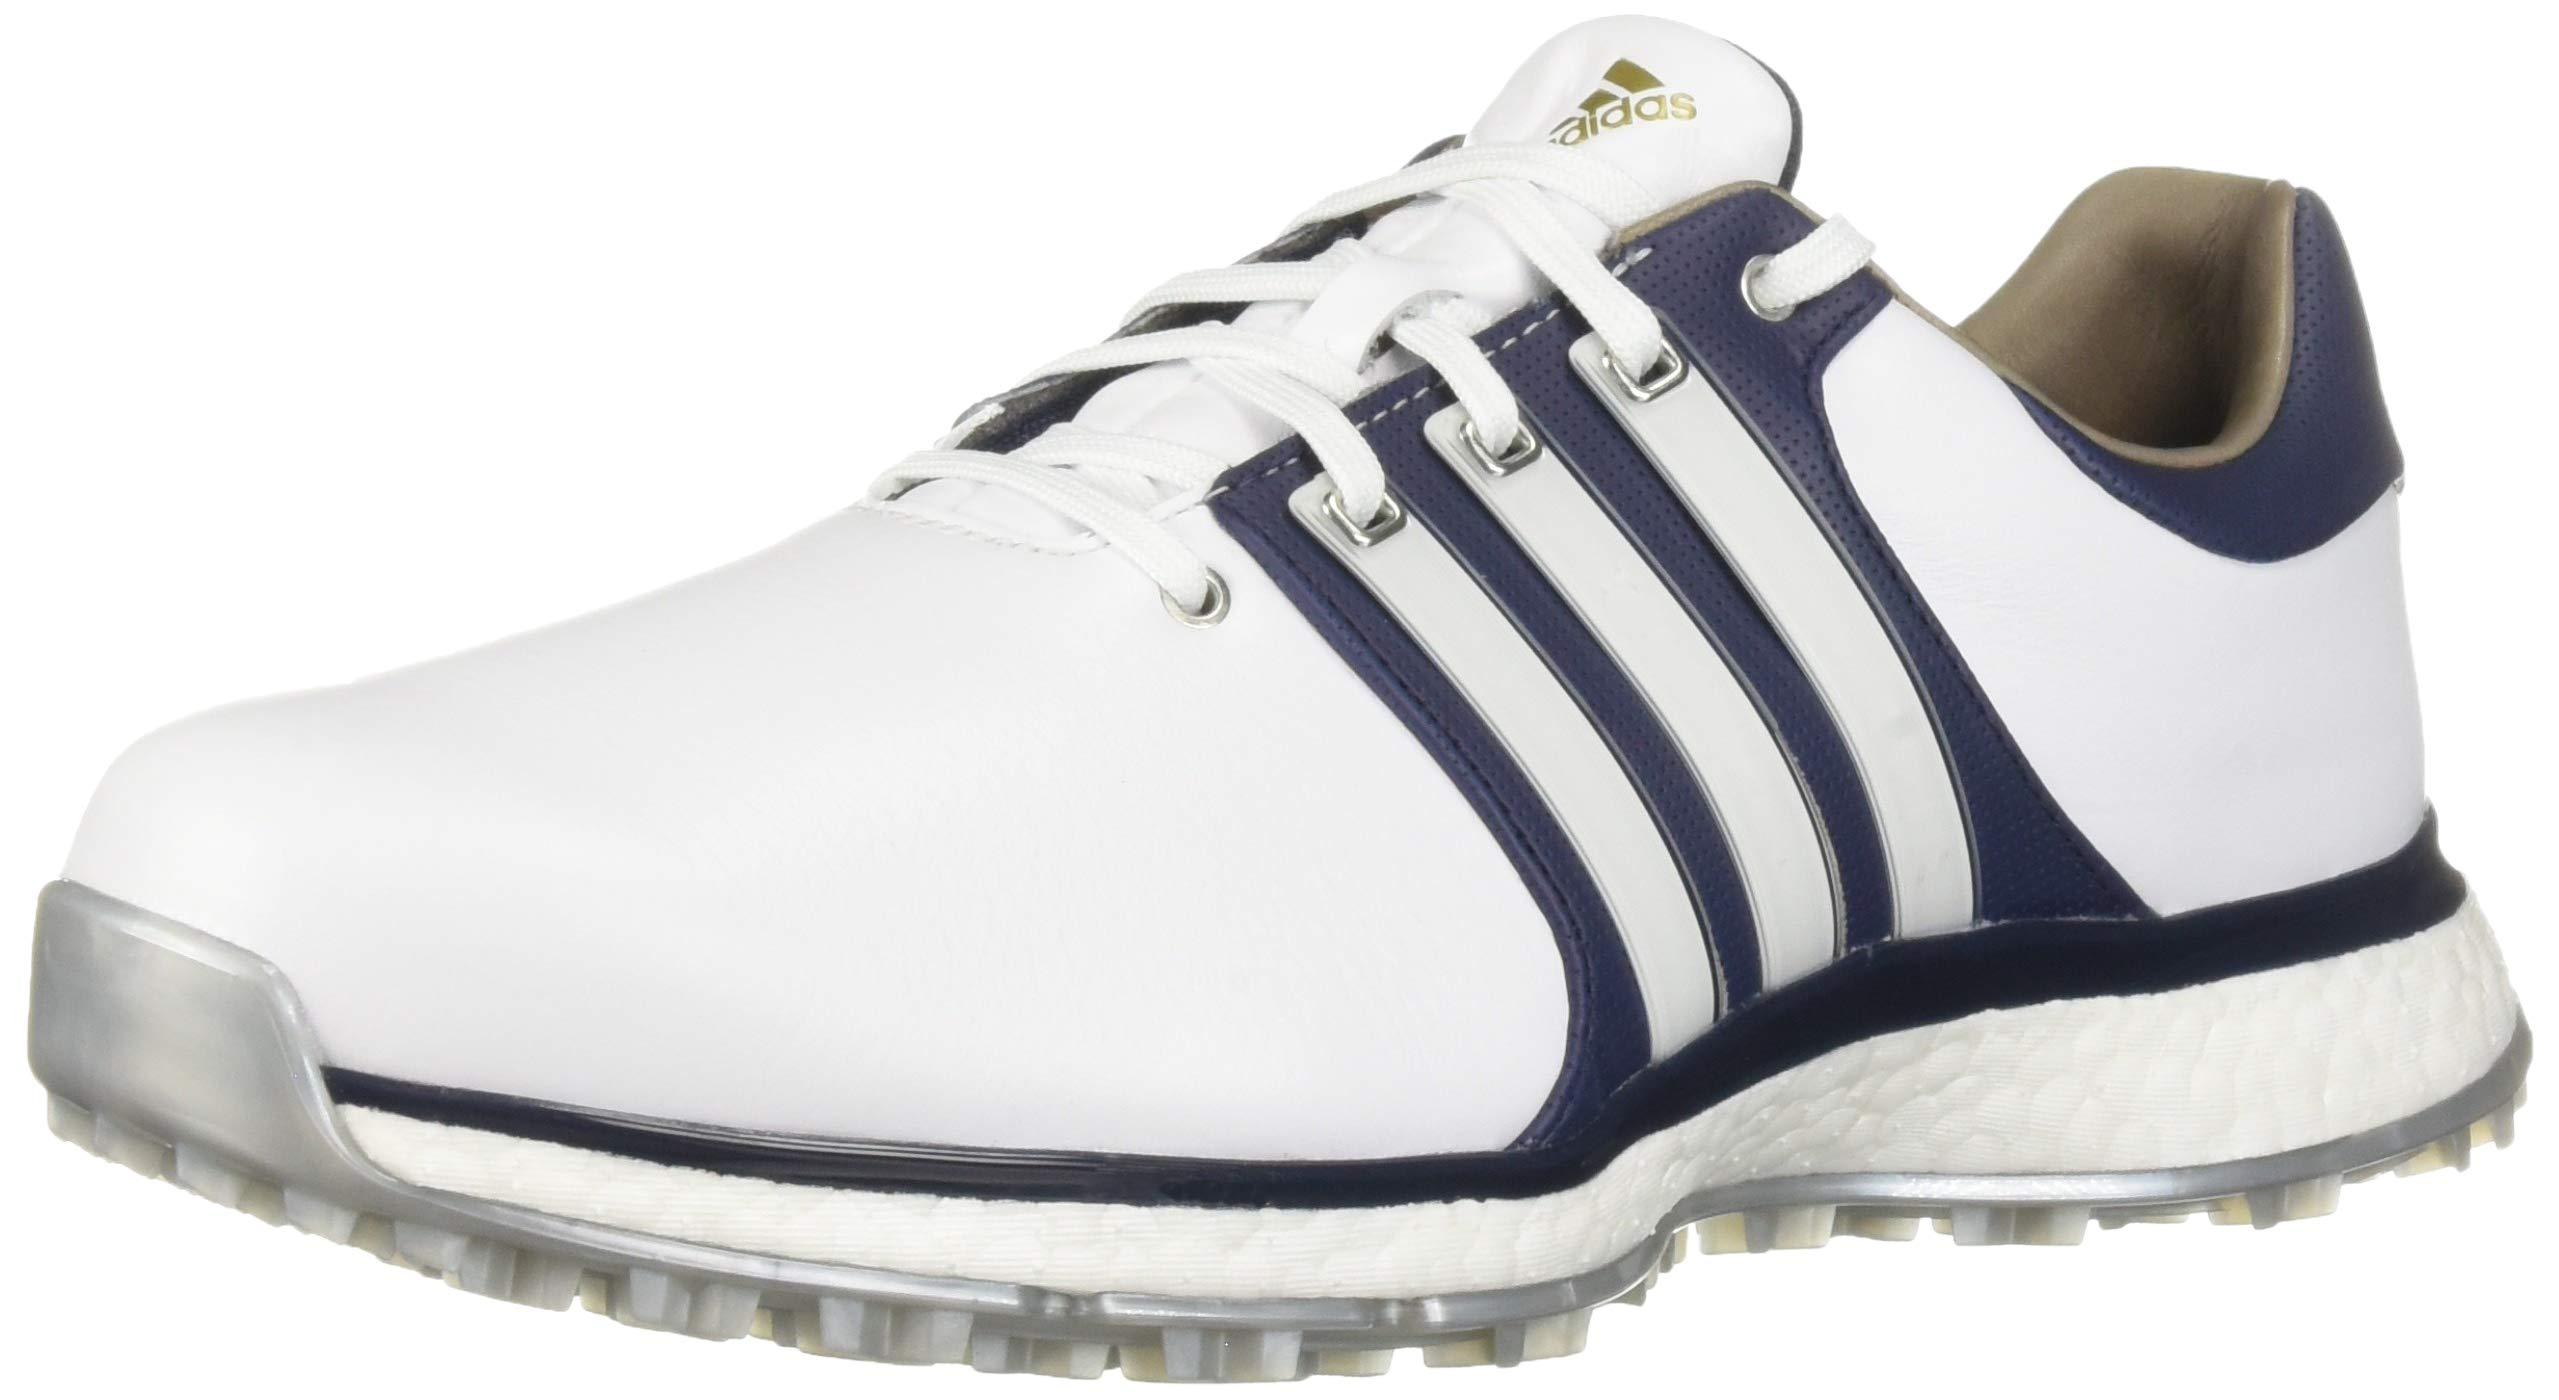 adidas Men's TOUR360 XT Spikeless Golf Shoe, FTWR White/Collegiate Navy/Silver Metallic, 7 M US